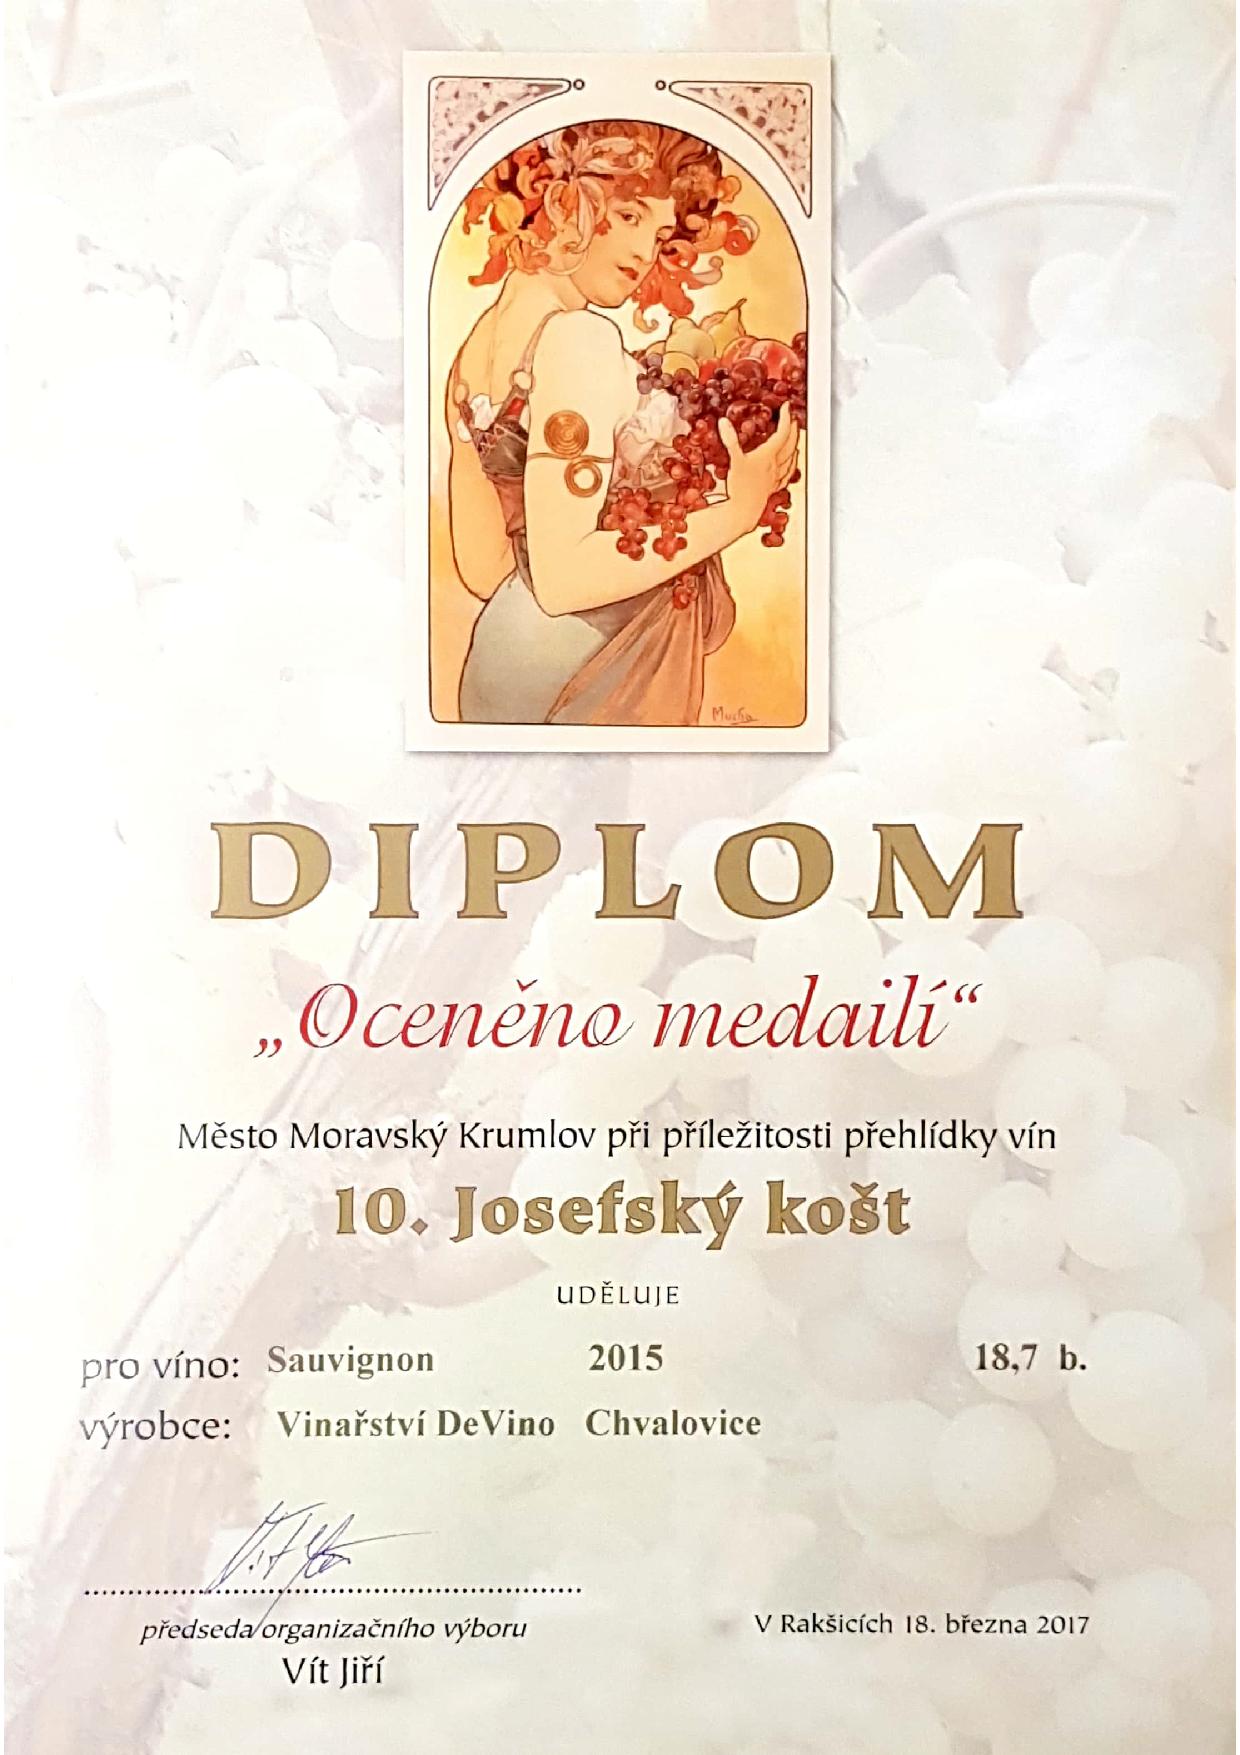 NewDoc 2018-02-19 (1)_Stránka_6